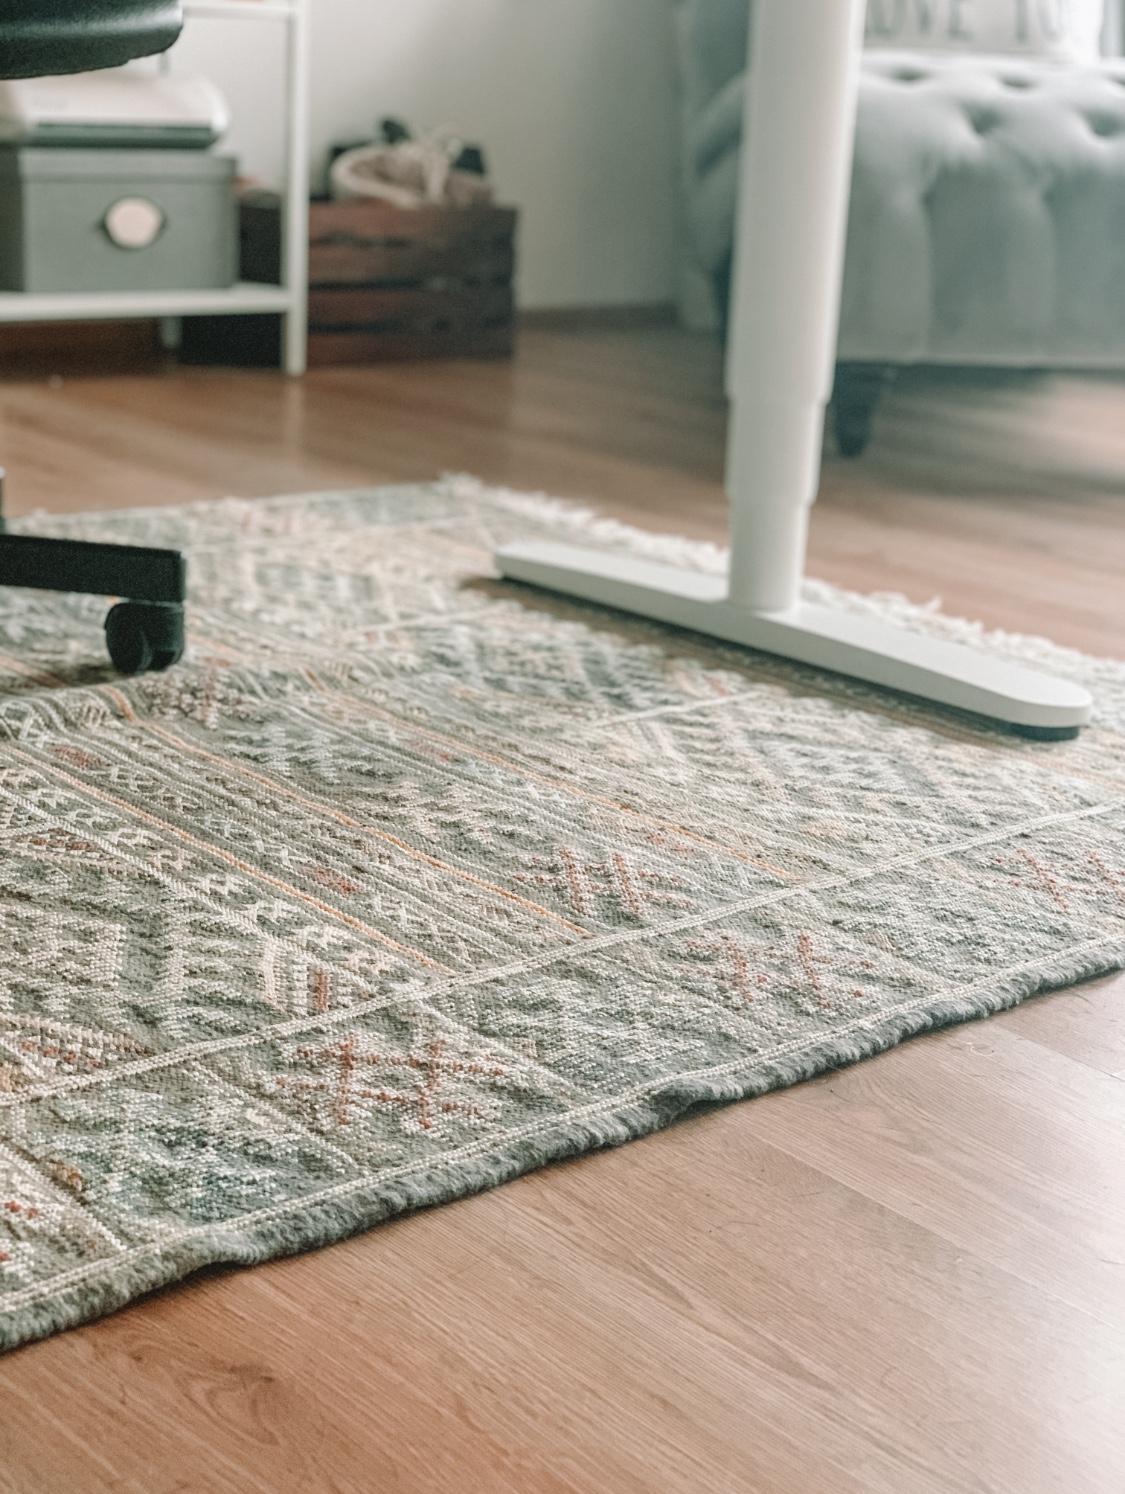 img 7631 - Buying a Moroccan Rug